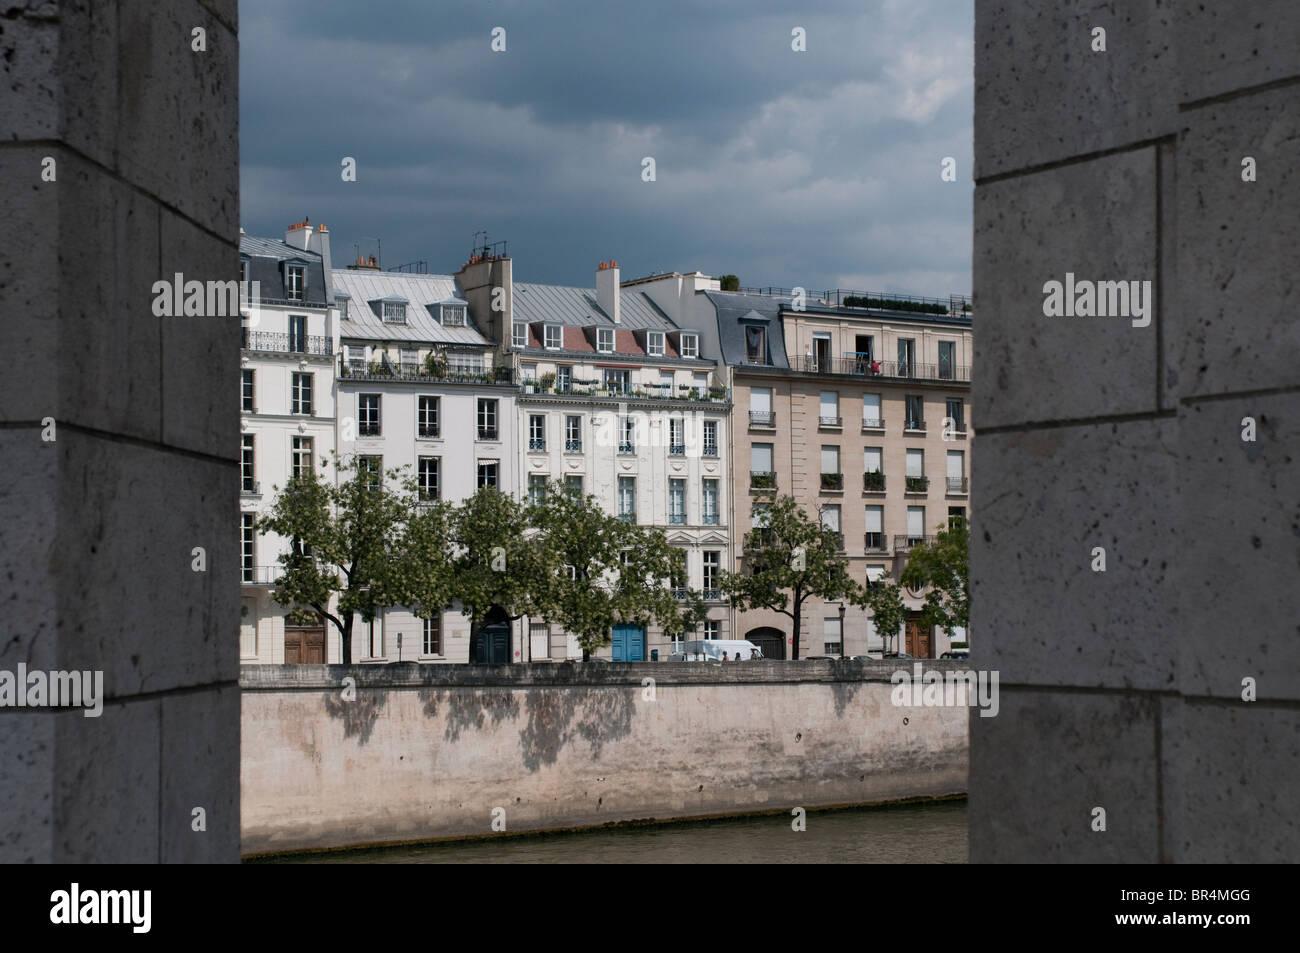 Apartment blocks on Ile St Louis, Paris, France - Stock Image